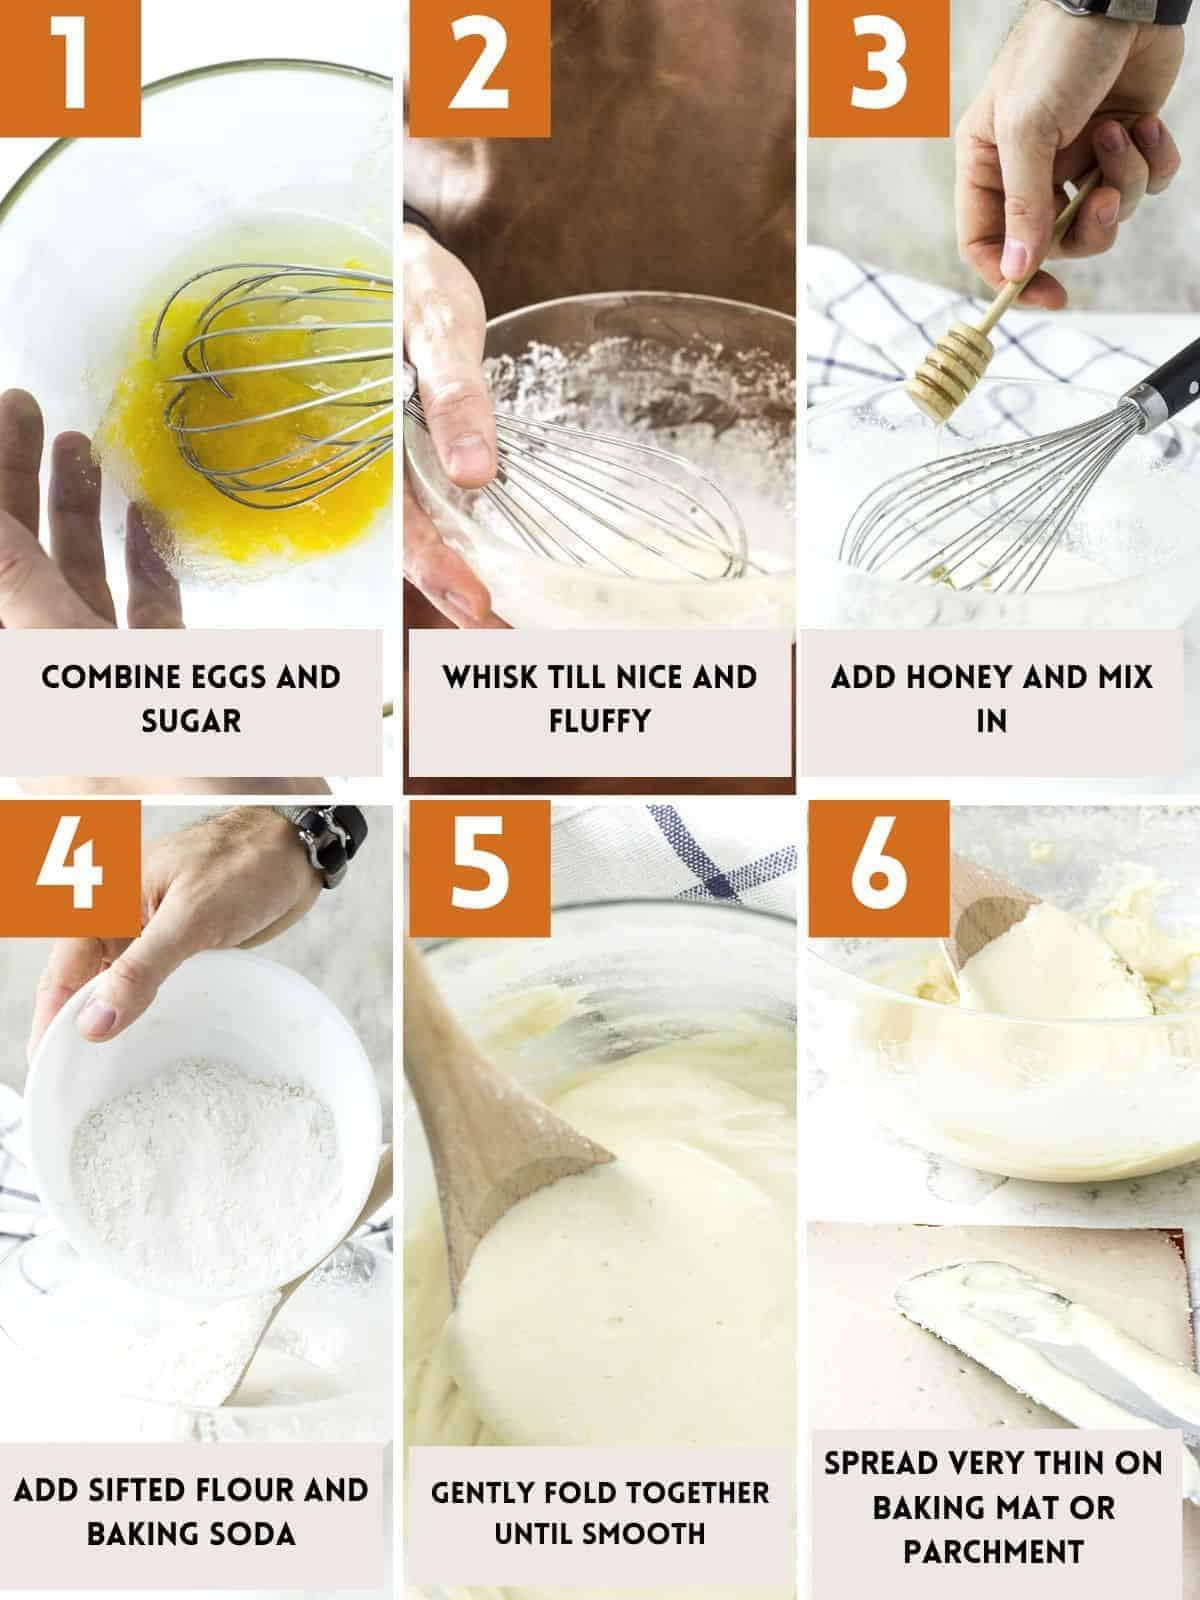 Russian honey cake batter making instructions